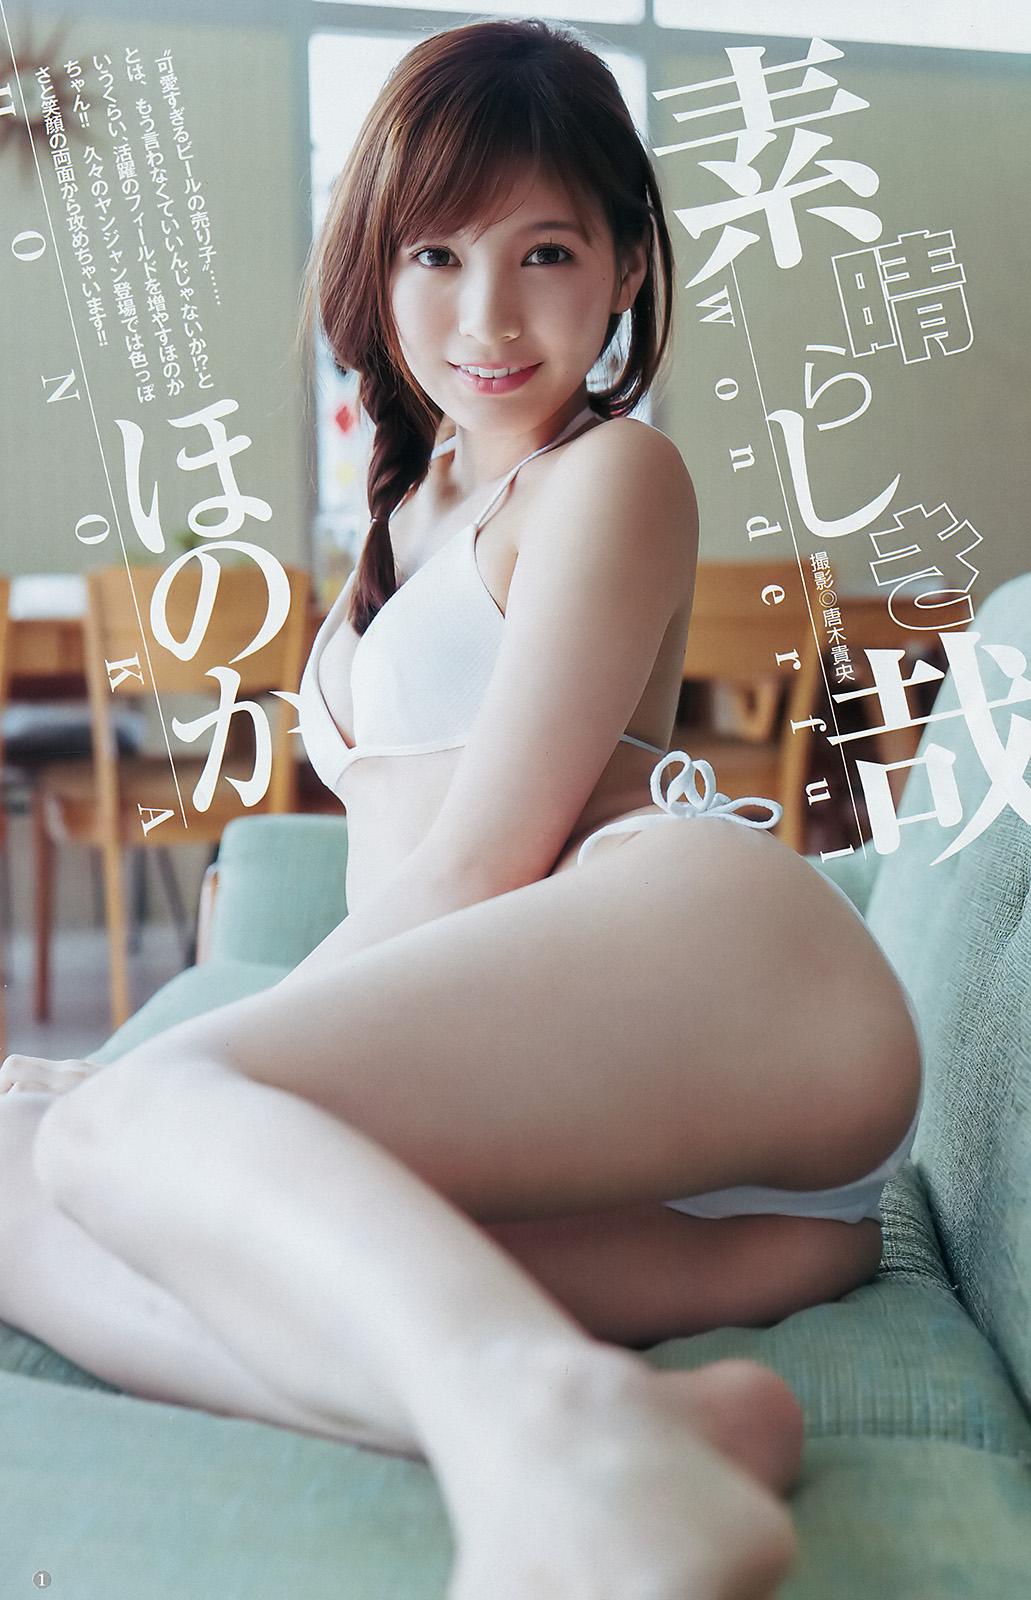 Honoka ほのか, Young Jump 2017 No.51 (週刊ヤングジャンプ 2017年51号)